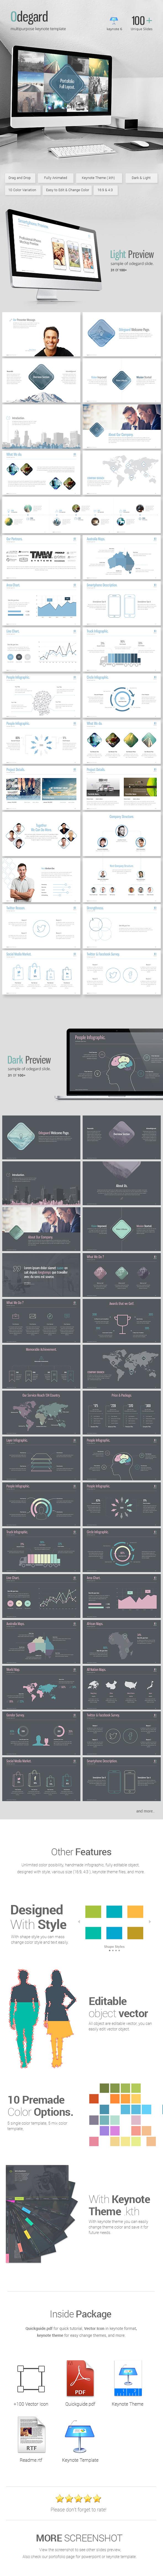 Odegard - Simple Keynote Presentation Template - Business Keynote Templates